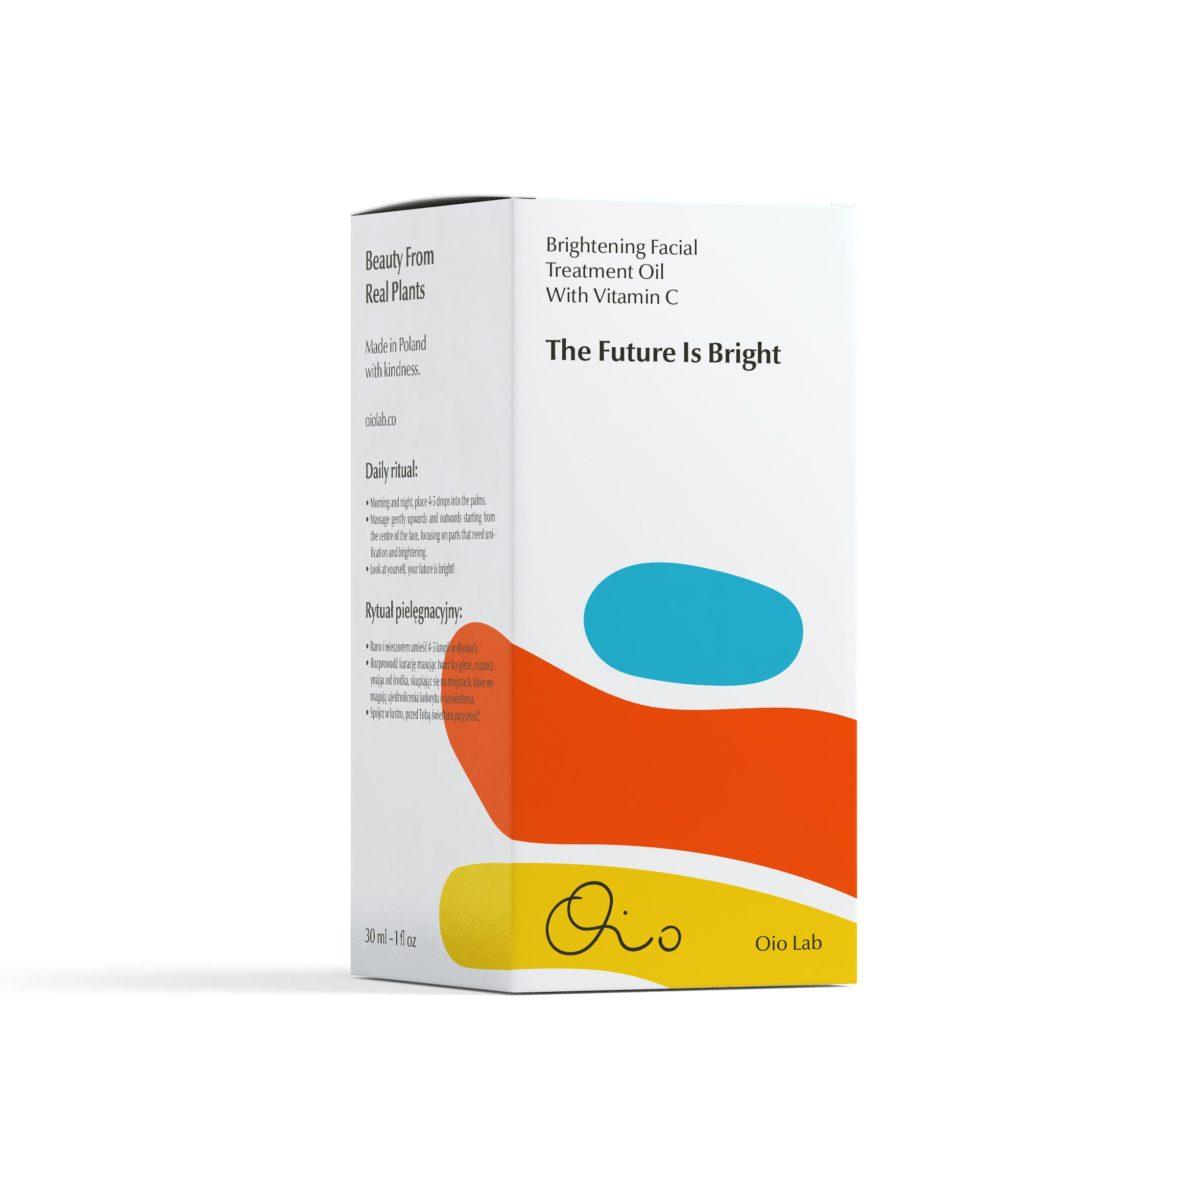 OIO LAB The Future Is Bright Kuracja Rozjaśniająca 3 | SoBio Beauty boutique | Cruelty-Free concept store